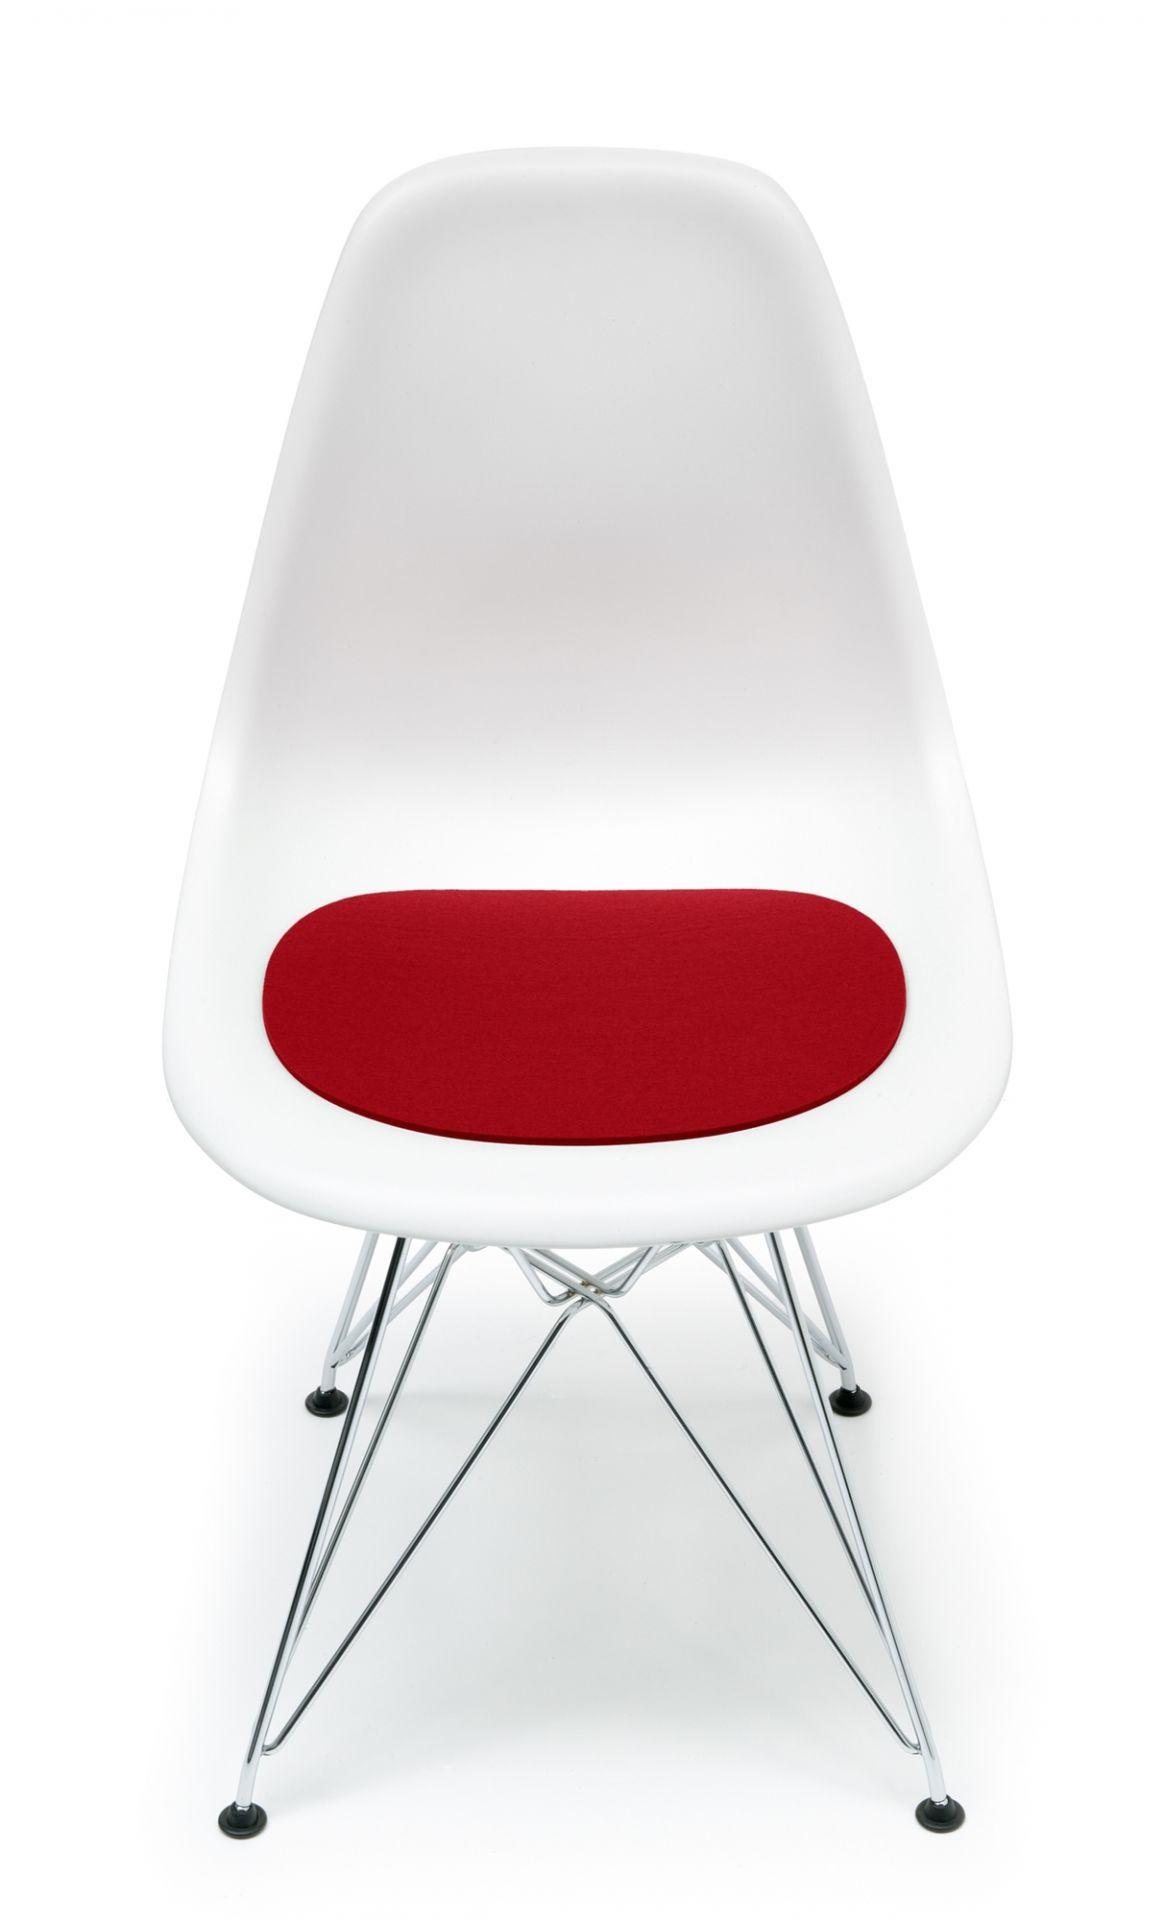 Sitzauflage-Filzauflage Eames Plastic Side Chairs DSR / DSW rot Hey Sign